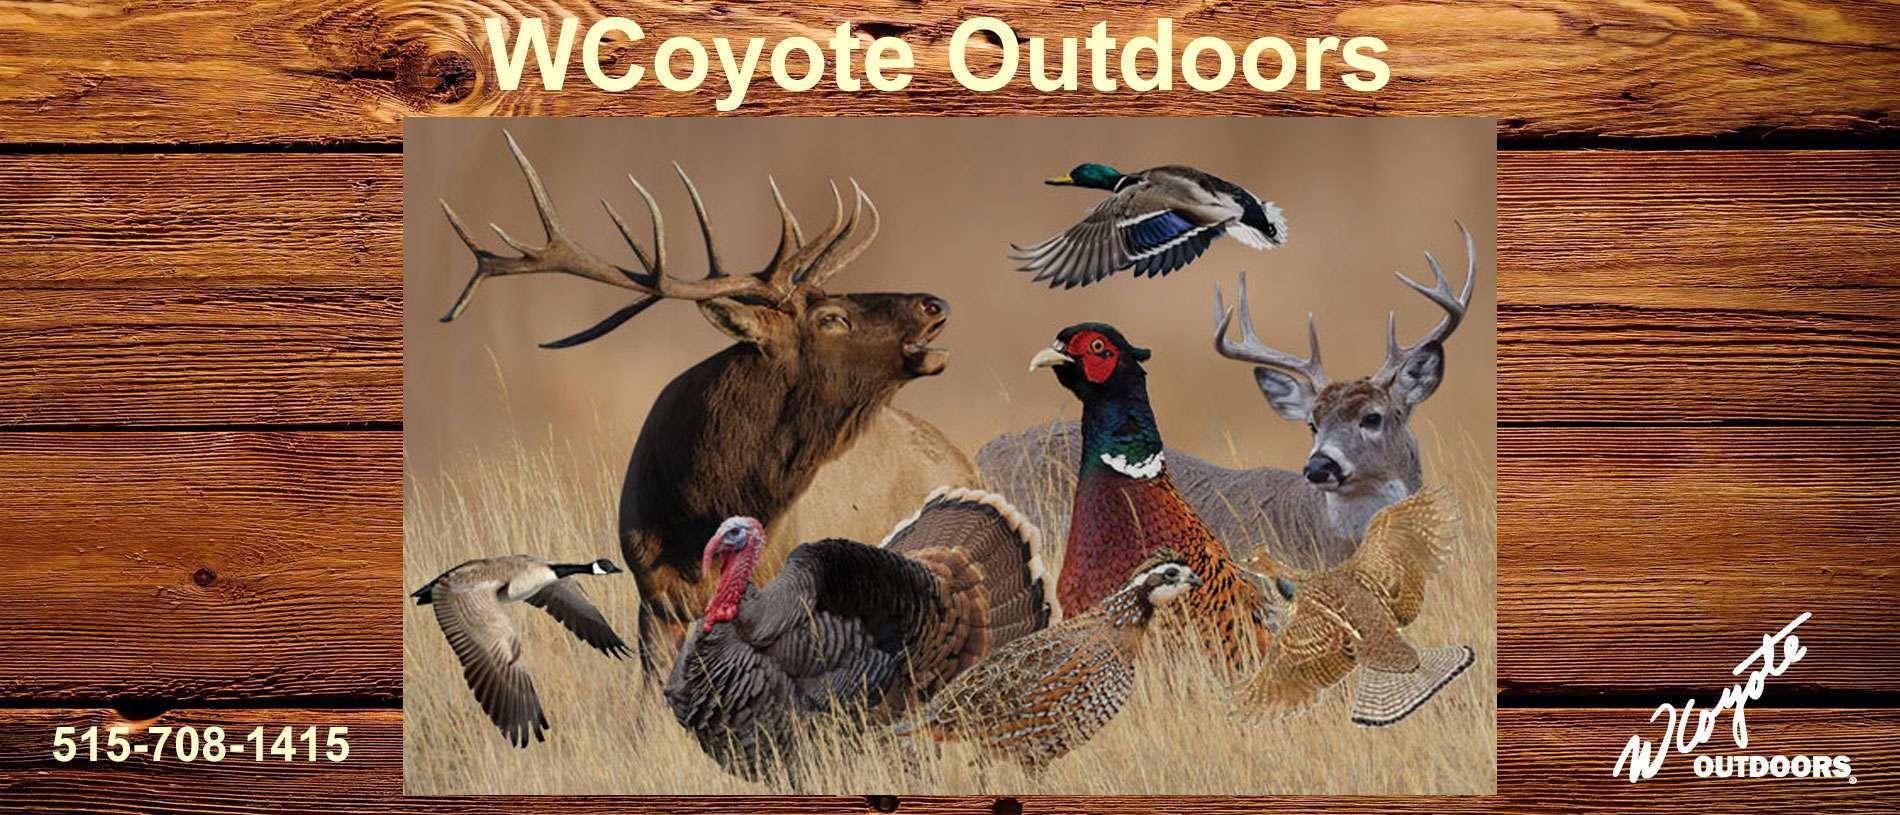 www.wcoyoteoutdoors.com